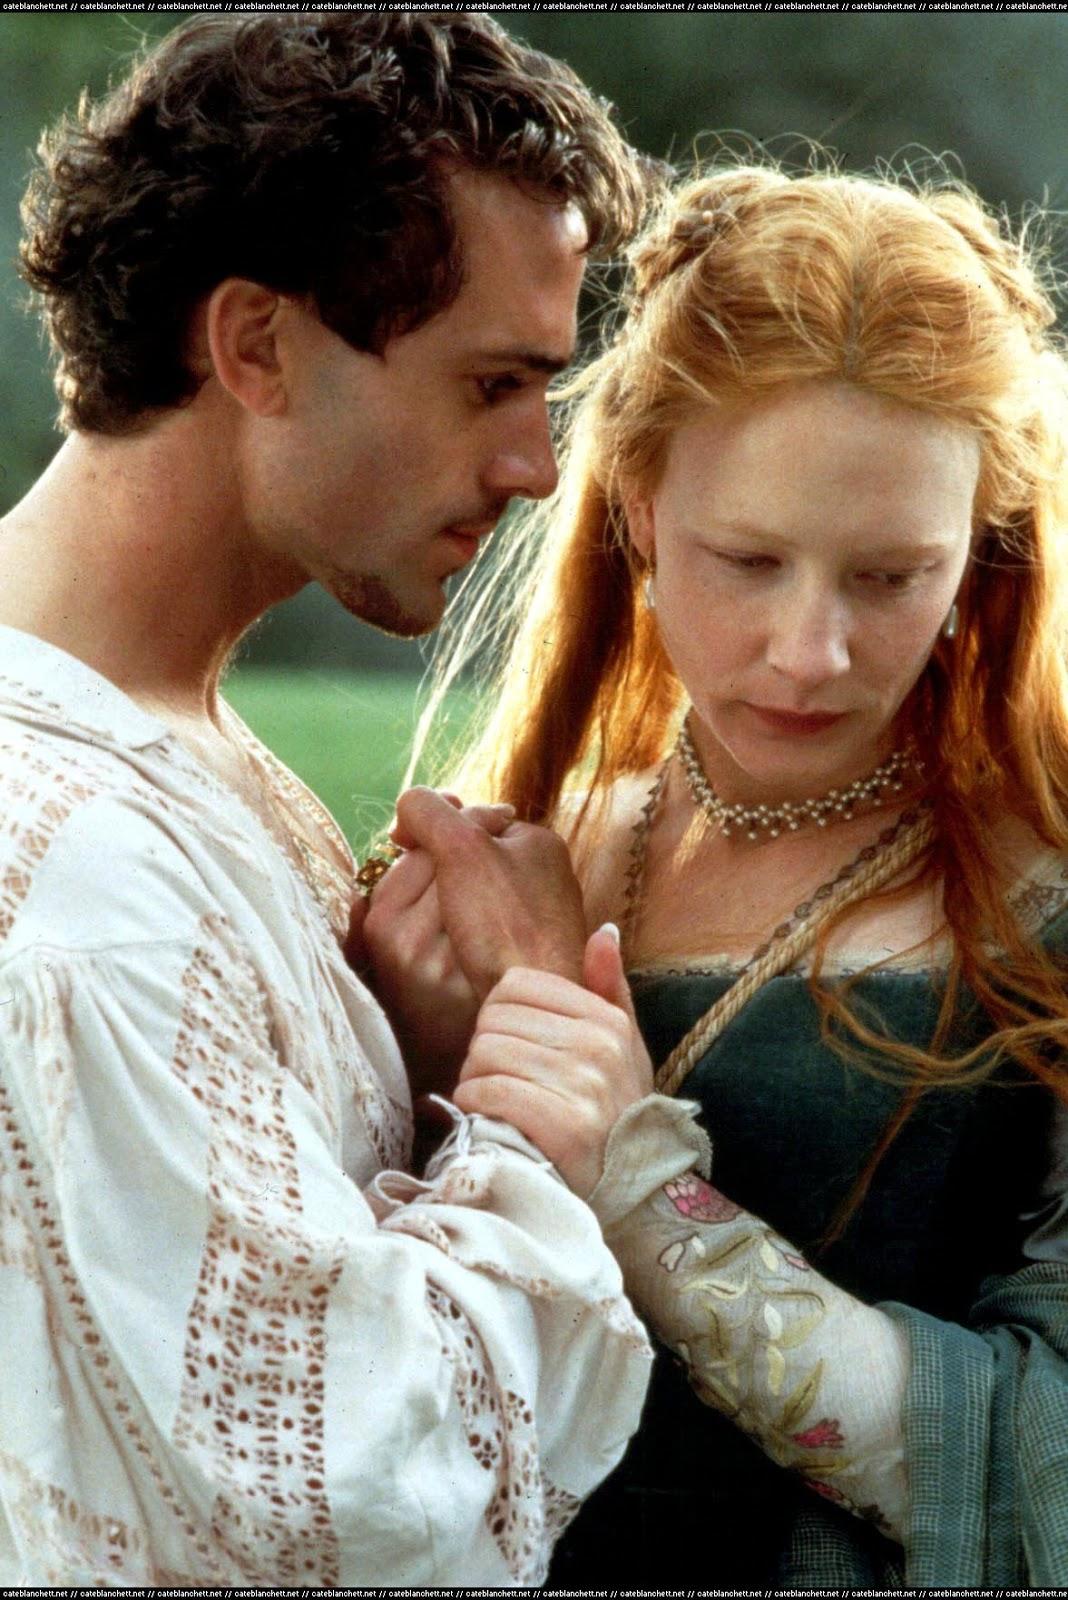 Movie Review: Elizabeth (1998) | The Ace Black Blog